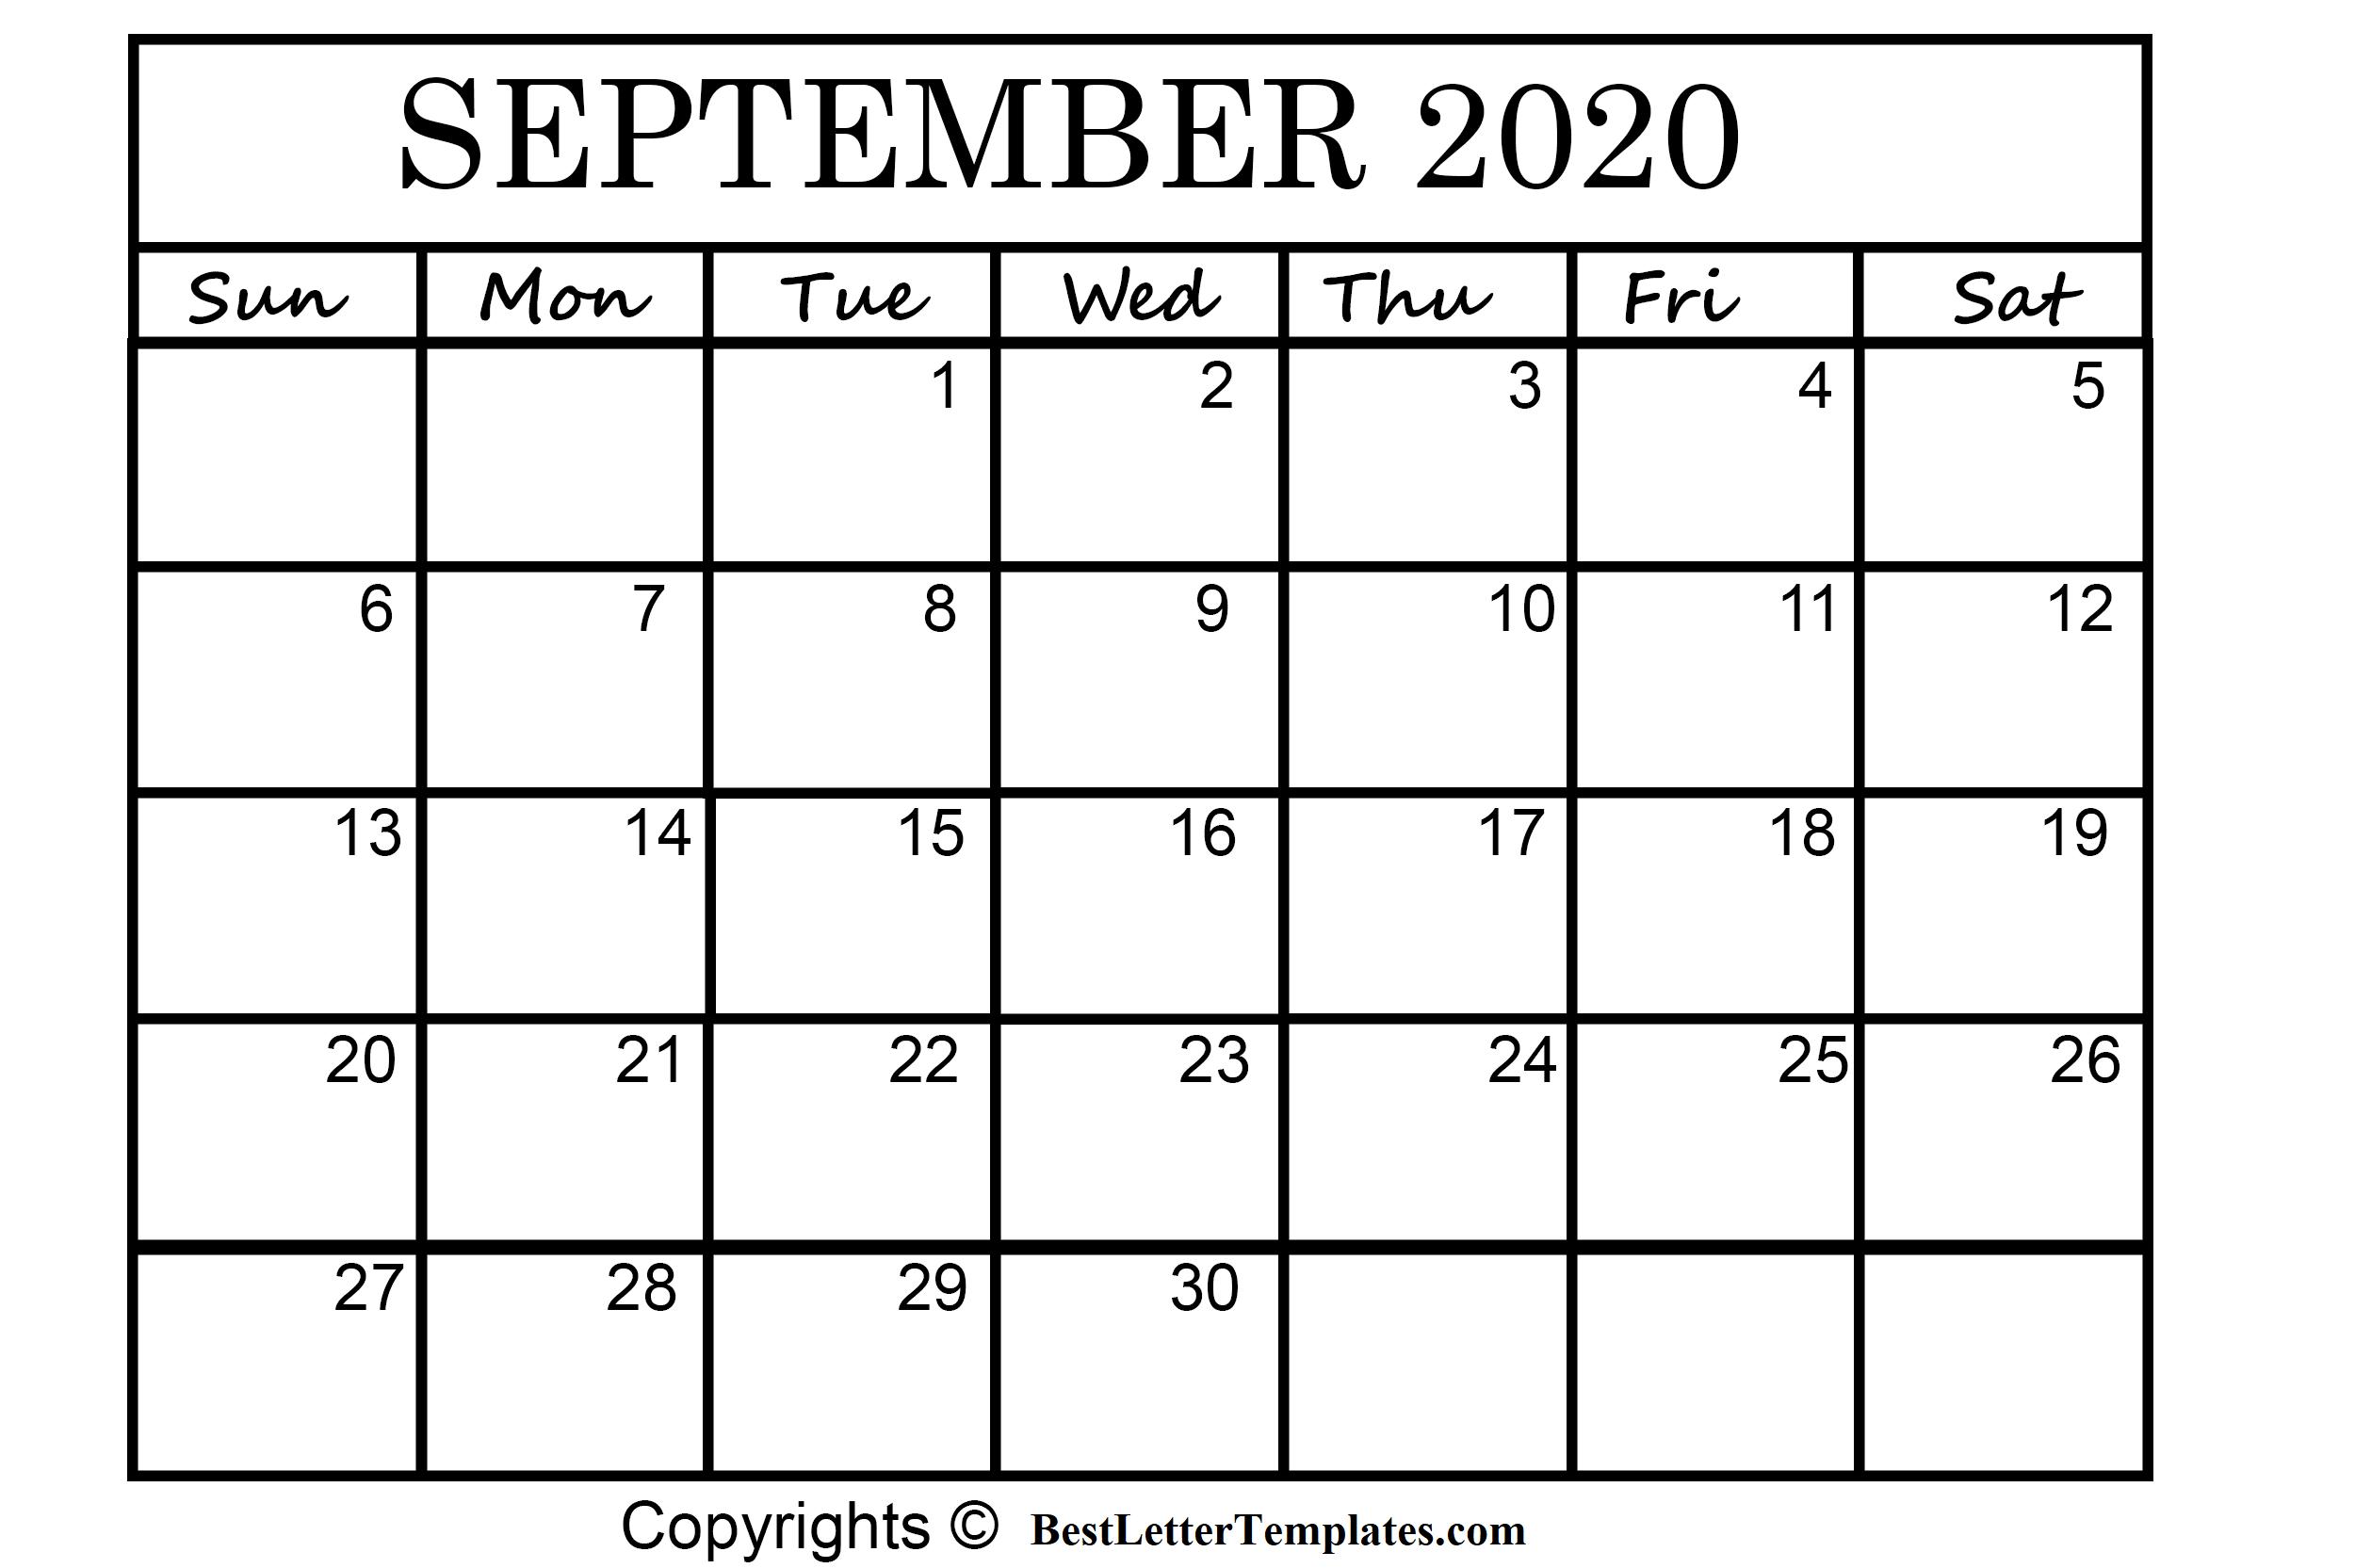 September 2020 Printable Calendar